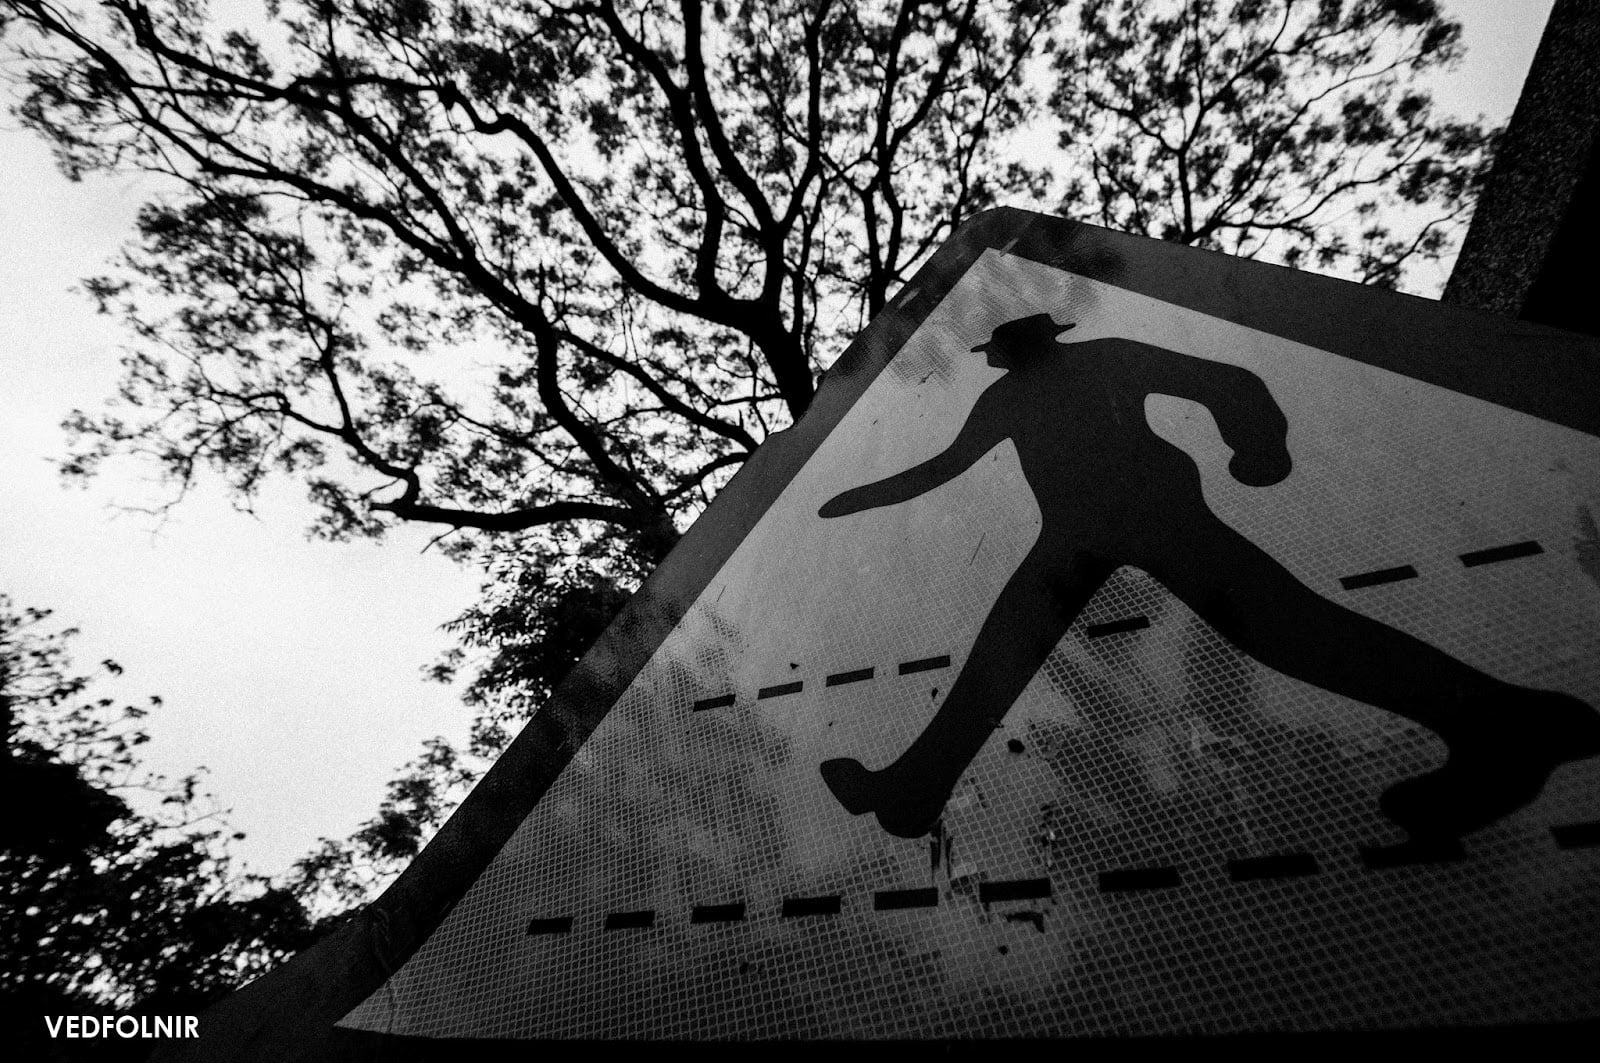 淡水-散步-路標-Tamsui-Walker-vedfolnir